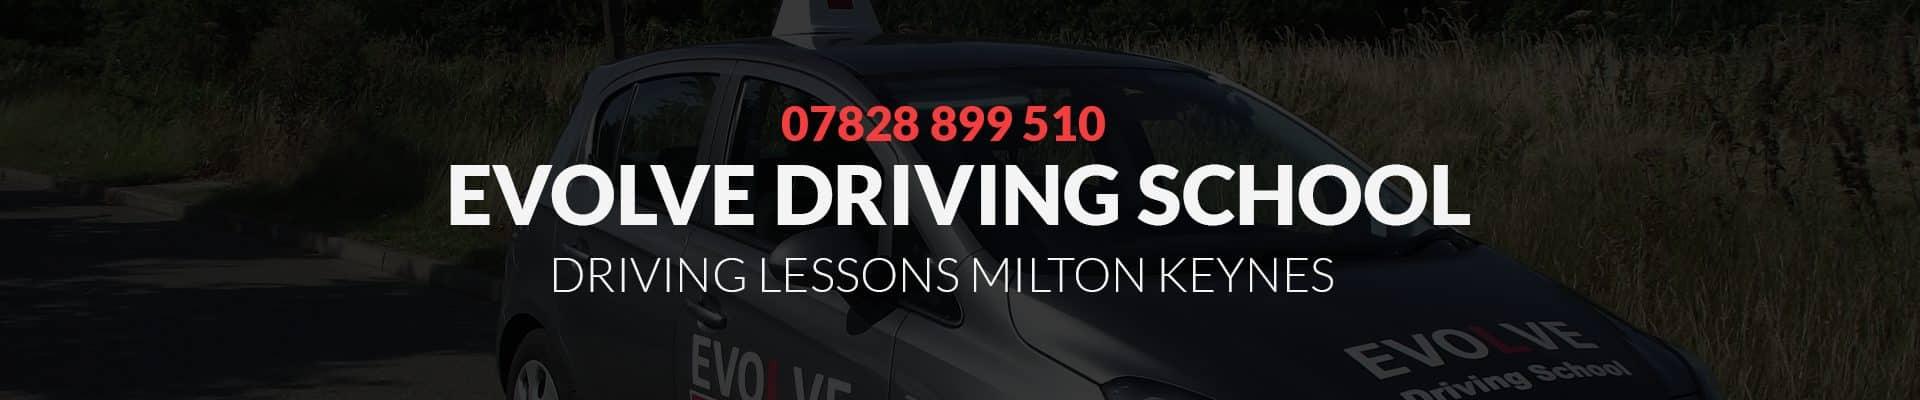 milton keynes driving lessons car image